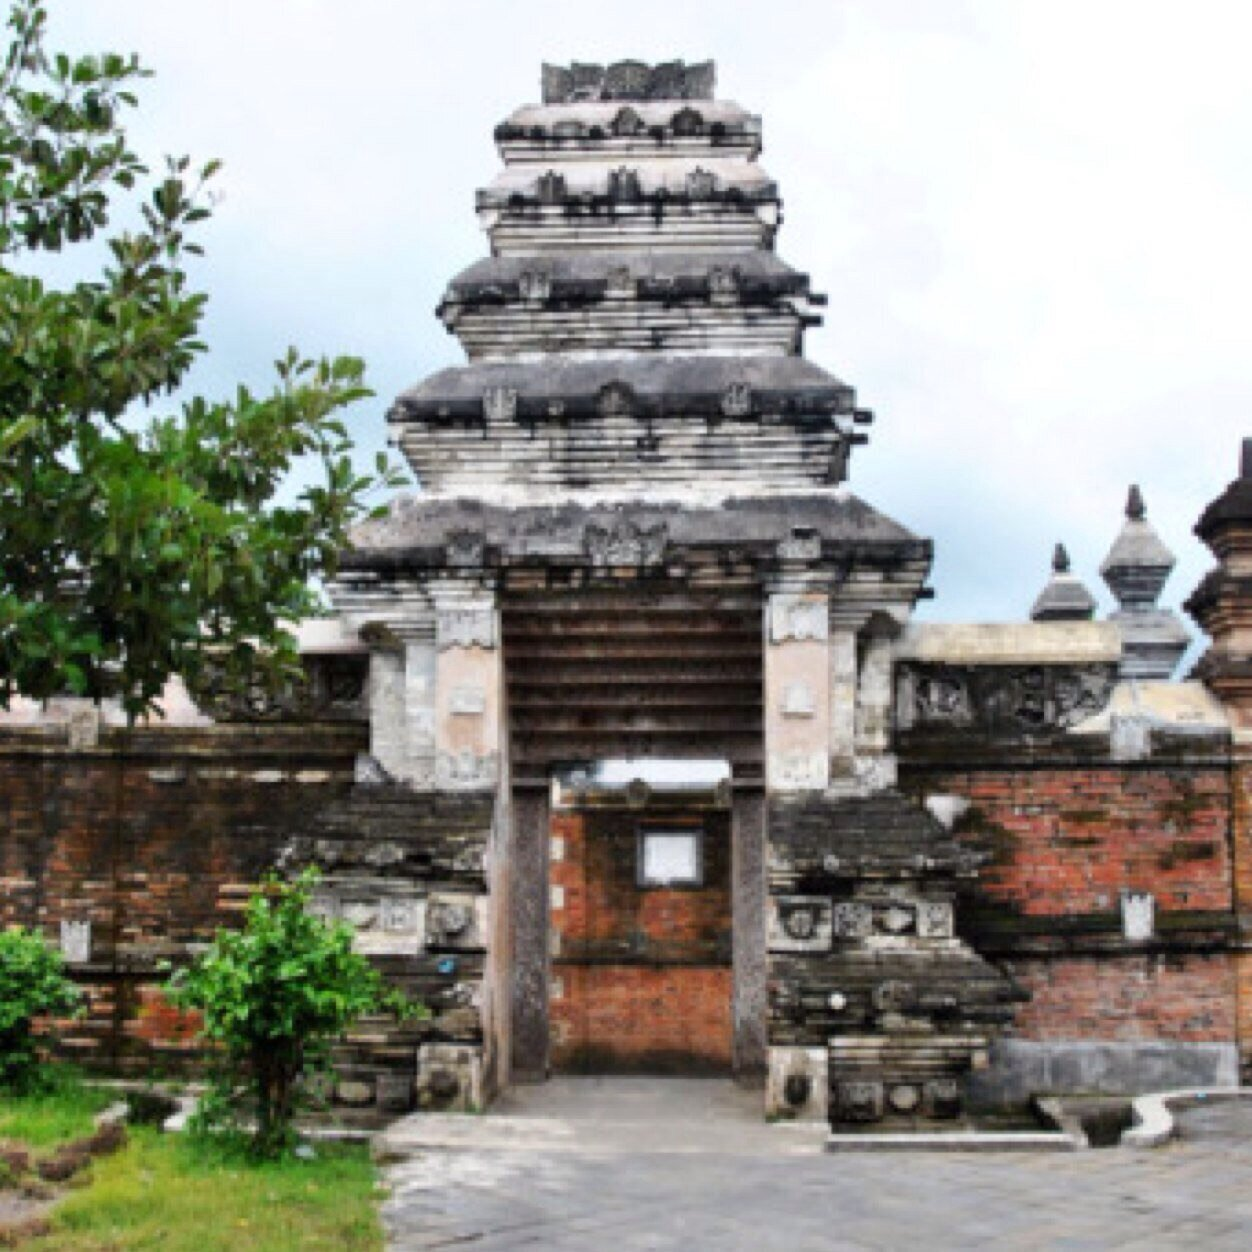 Ringkasan Sejarah Kerajaan Pajang Latelite Petilasan Kasultanan Kab Sukoharjo